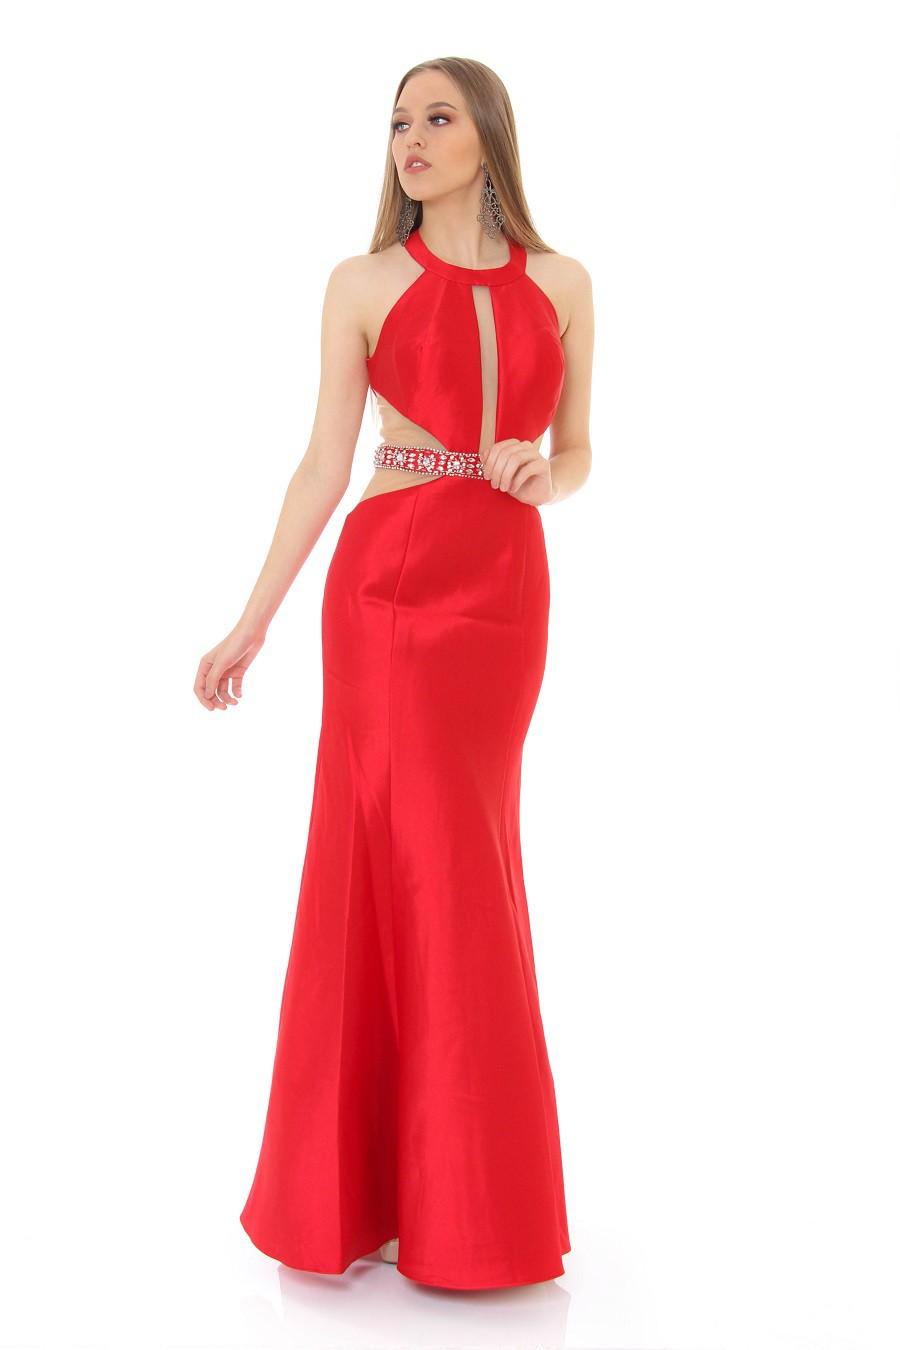 Vestido Vermelho 189